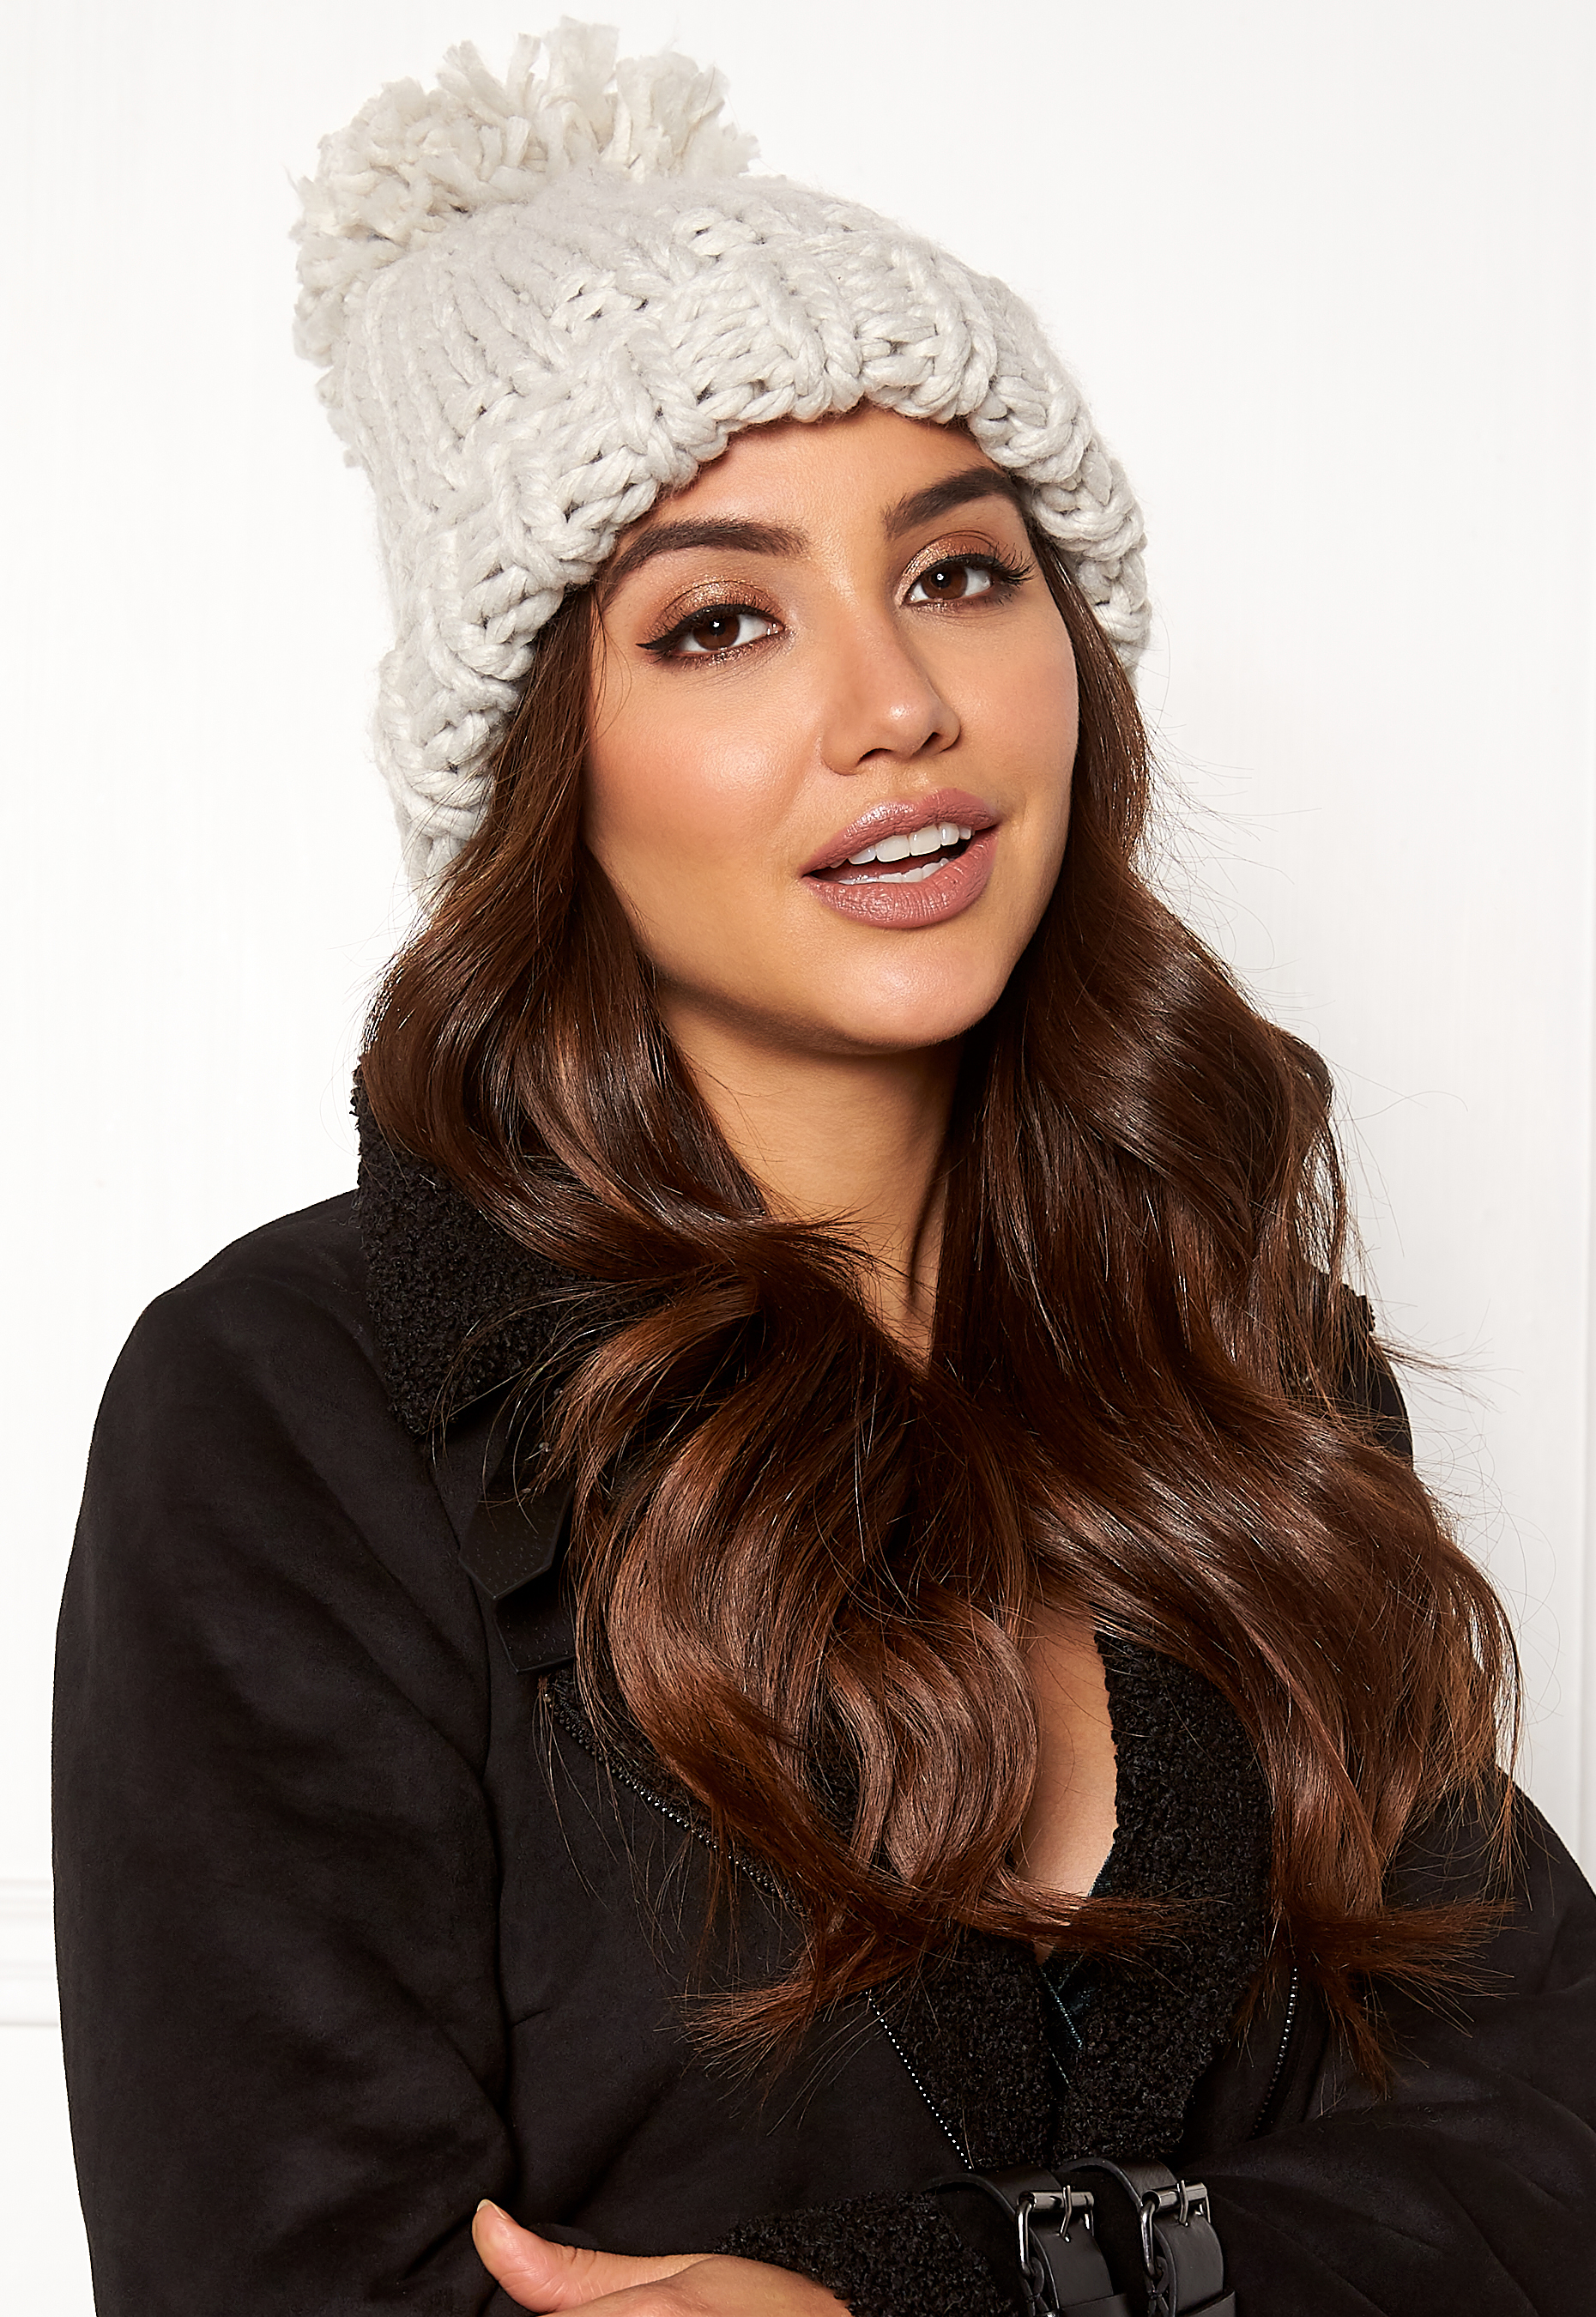 c10be59fd36 Svea josie hat grey bubbleroom jpg 1860x2700 Josie hat